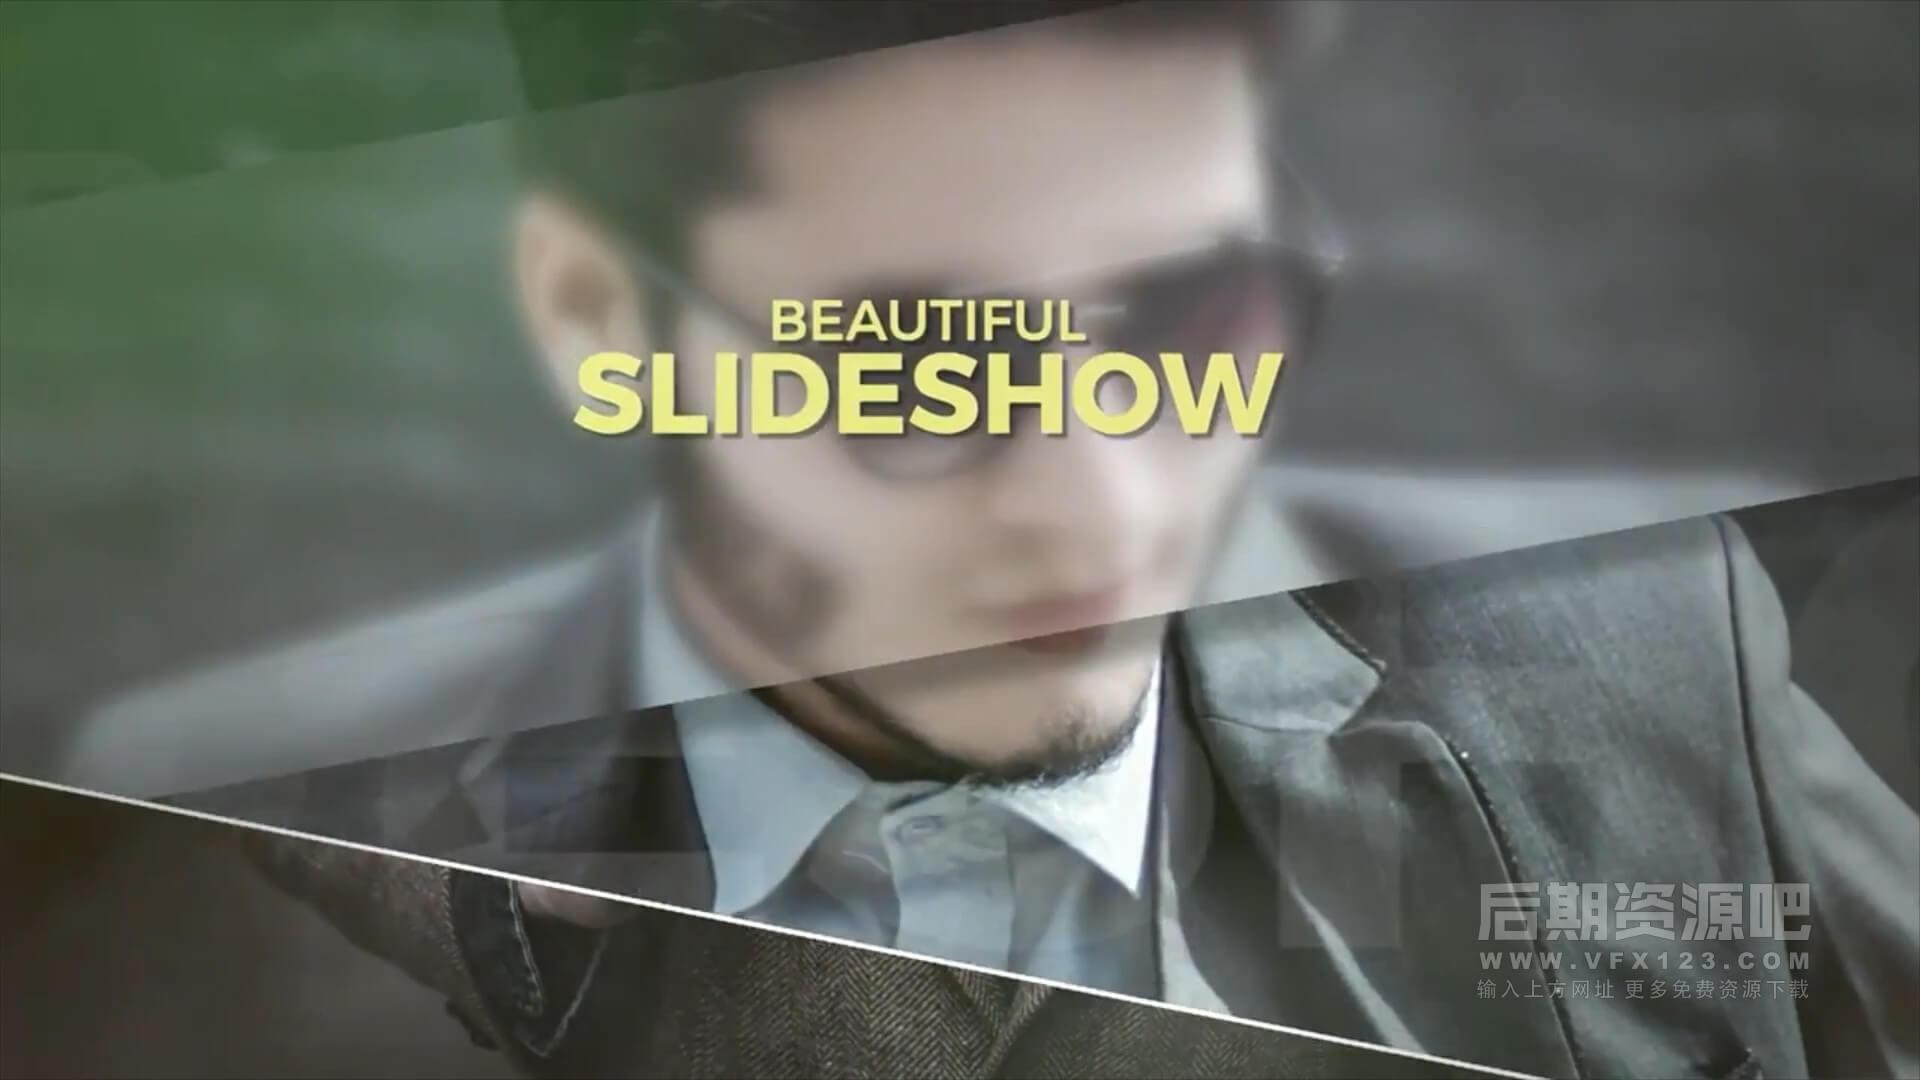 fcpx主题模板 毛玻璃光晕效果图文视频展示片头 Beautiful Slideshow